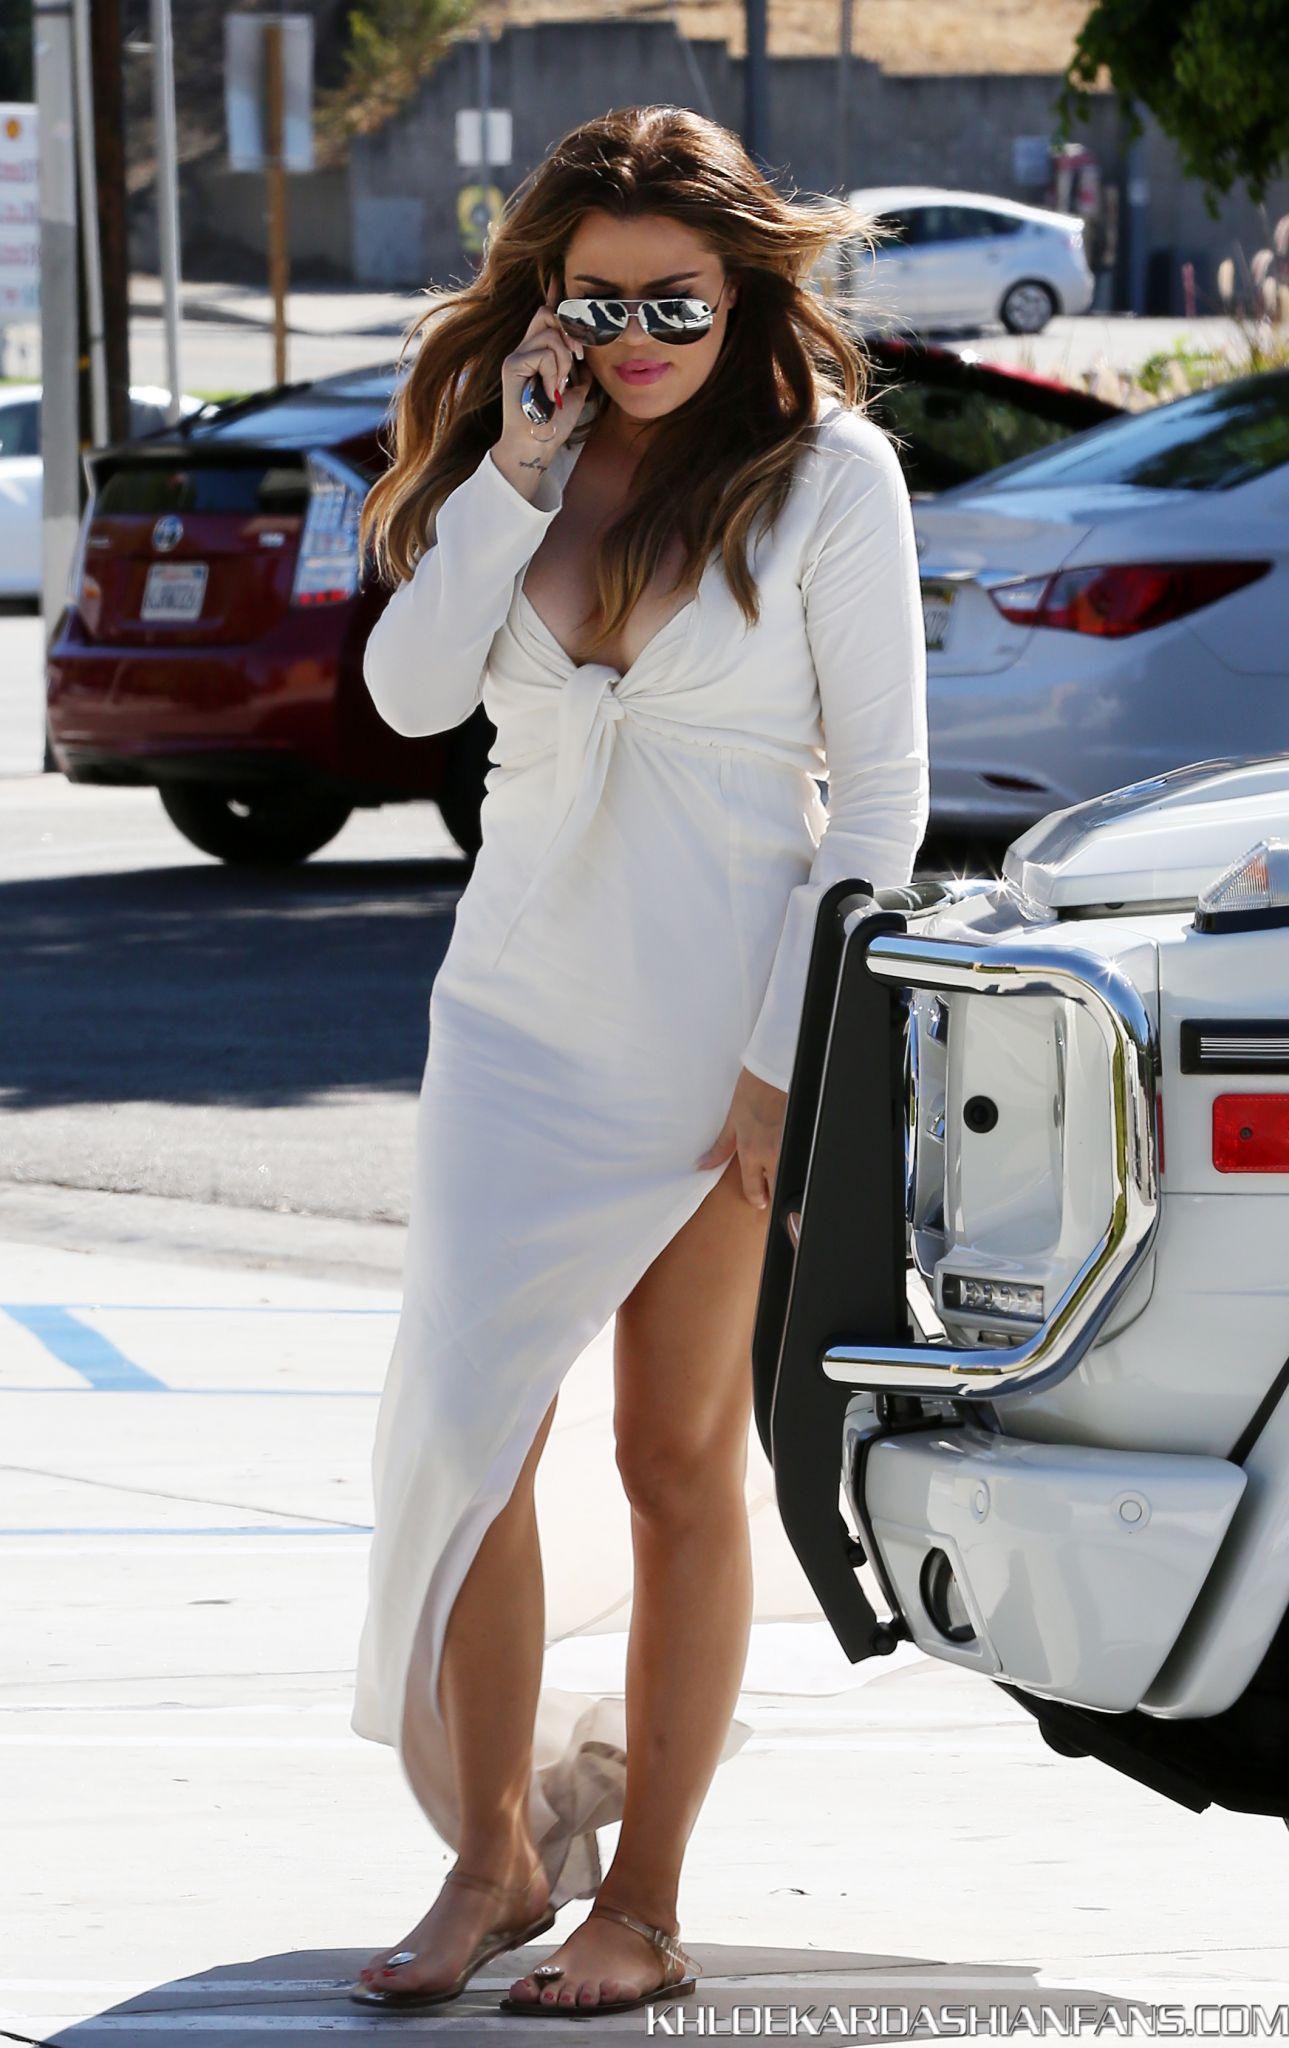 Khloe Kardashian 2014 : Khloe Kardashian in White Dress -15